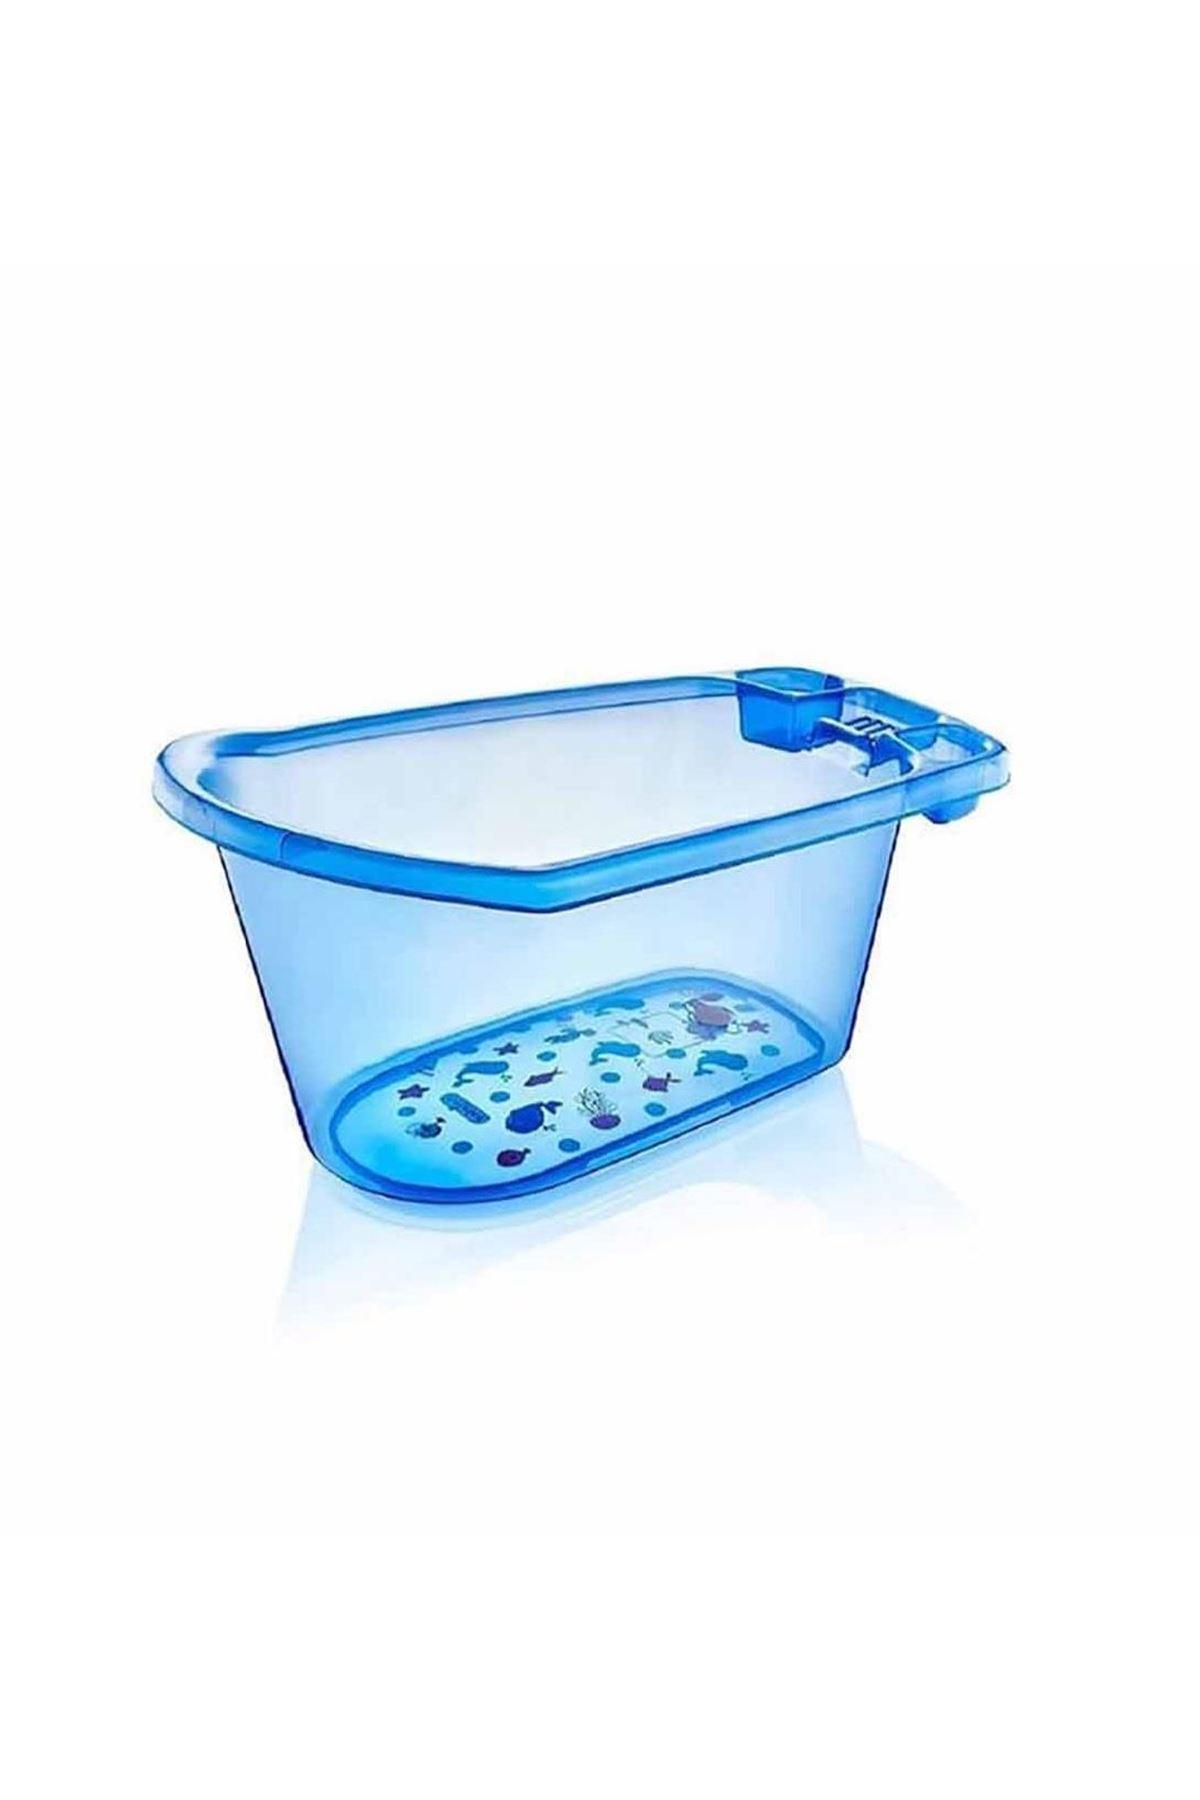 BabyJem Bebek Banyo Küveti Şeffaf Desenli 001 Mavi